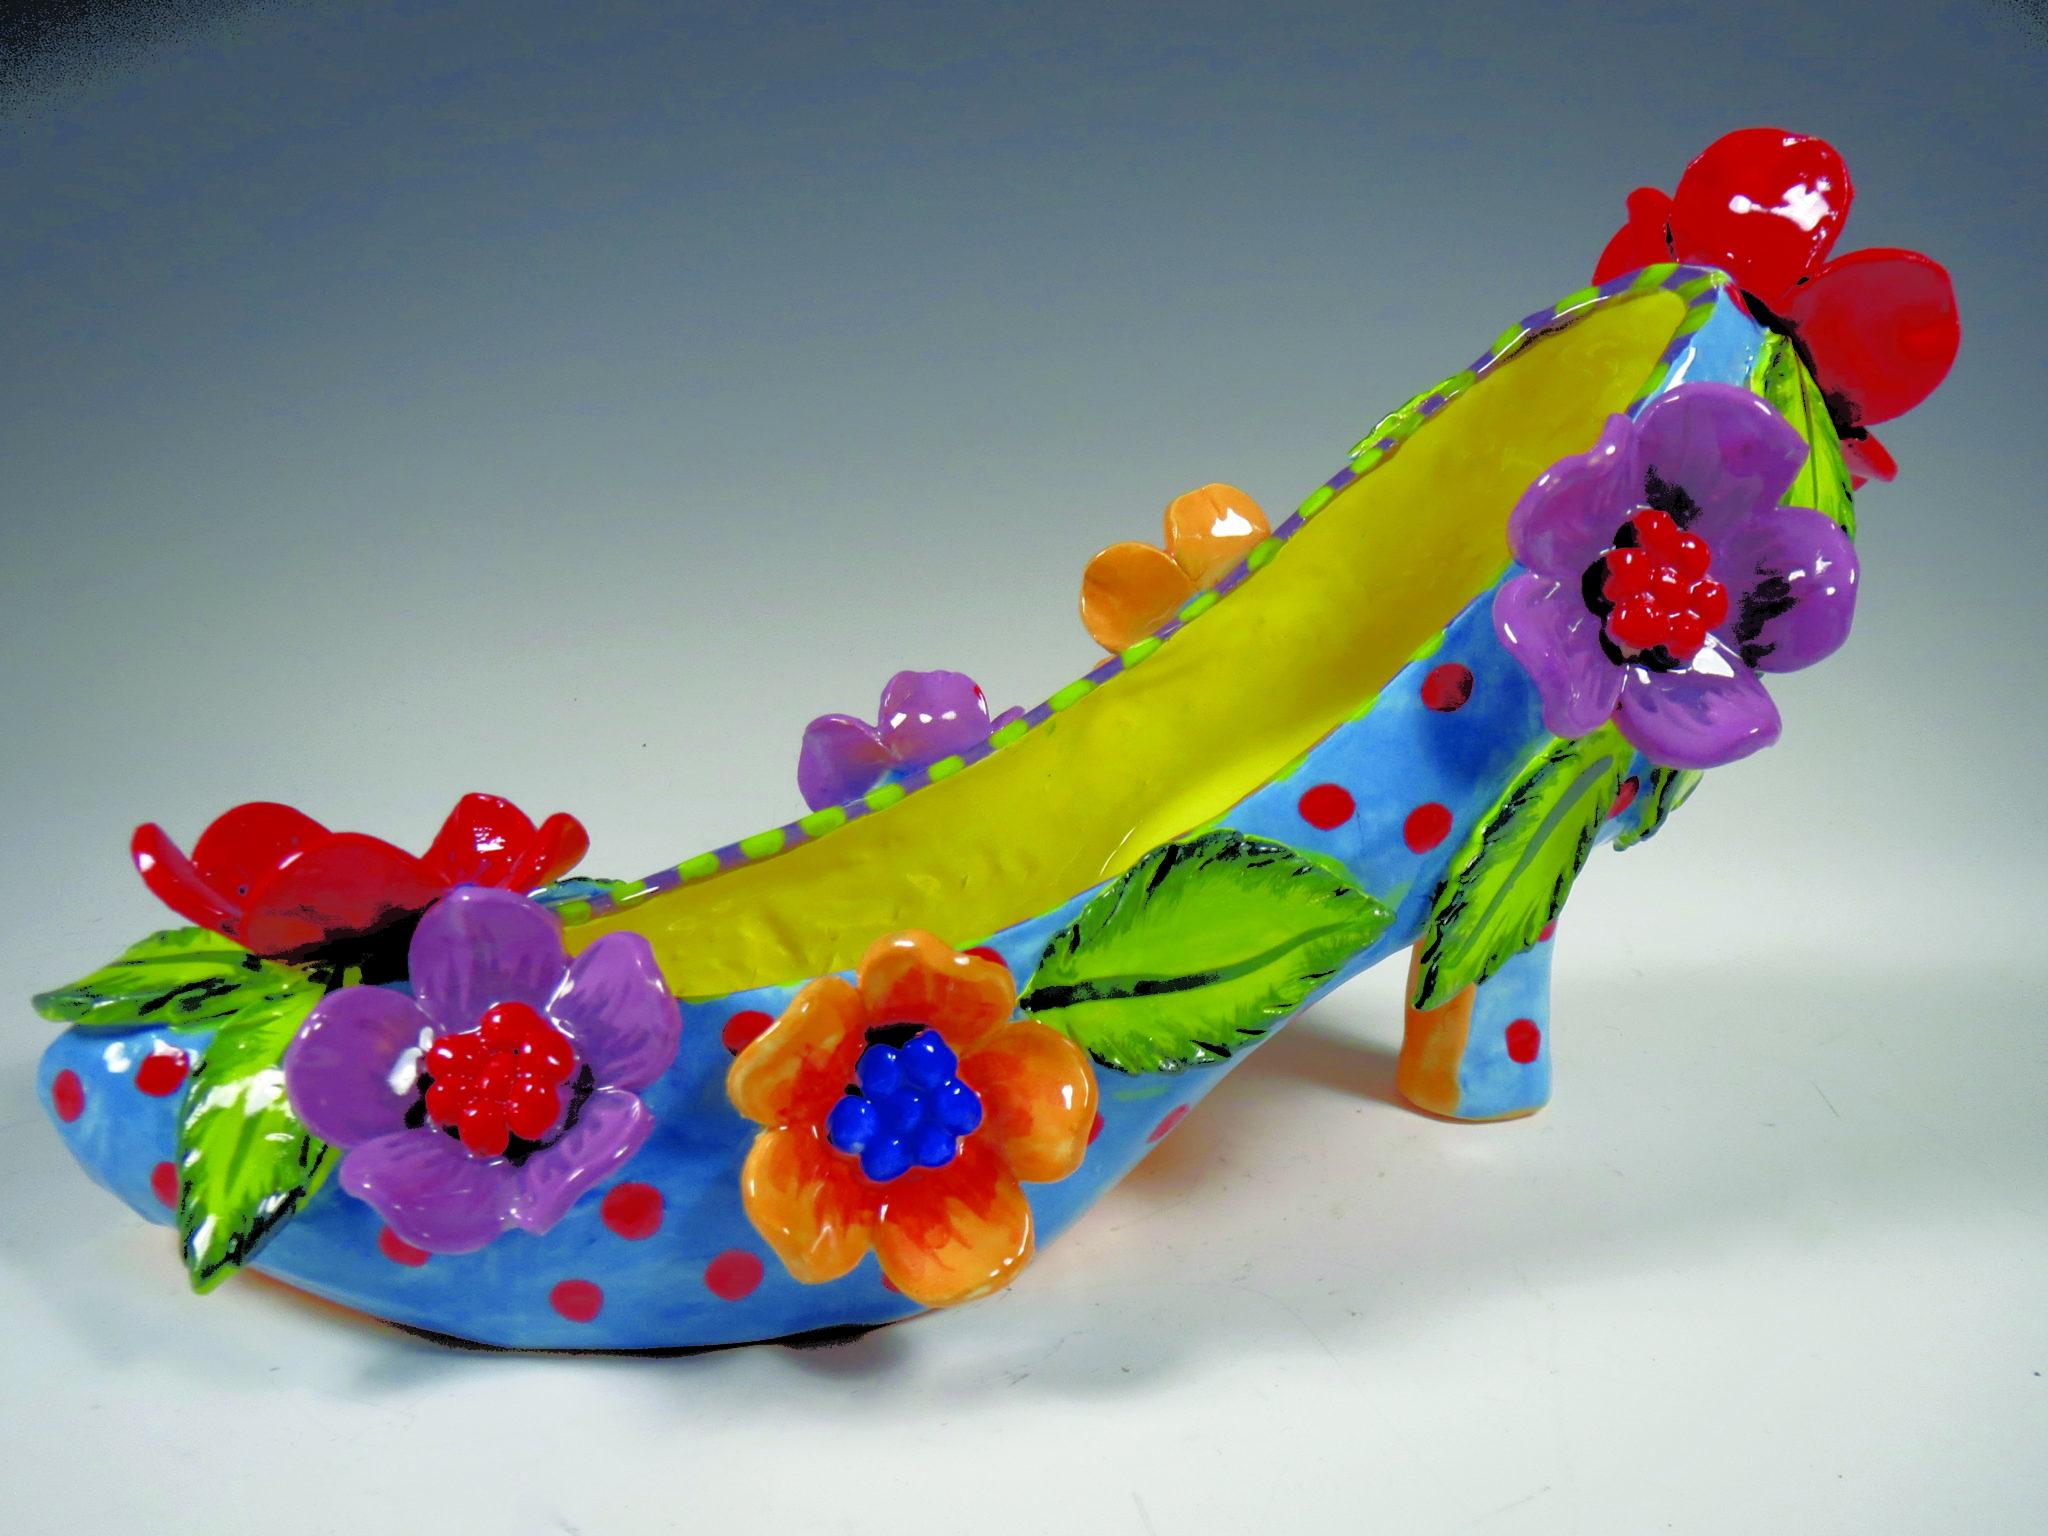 Jacqueline Thompson - Ceramic Artist - Board of Directors ACGA